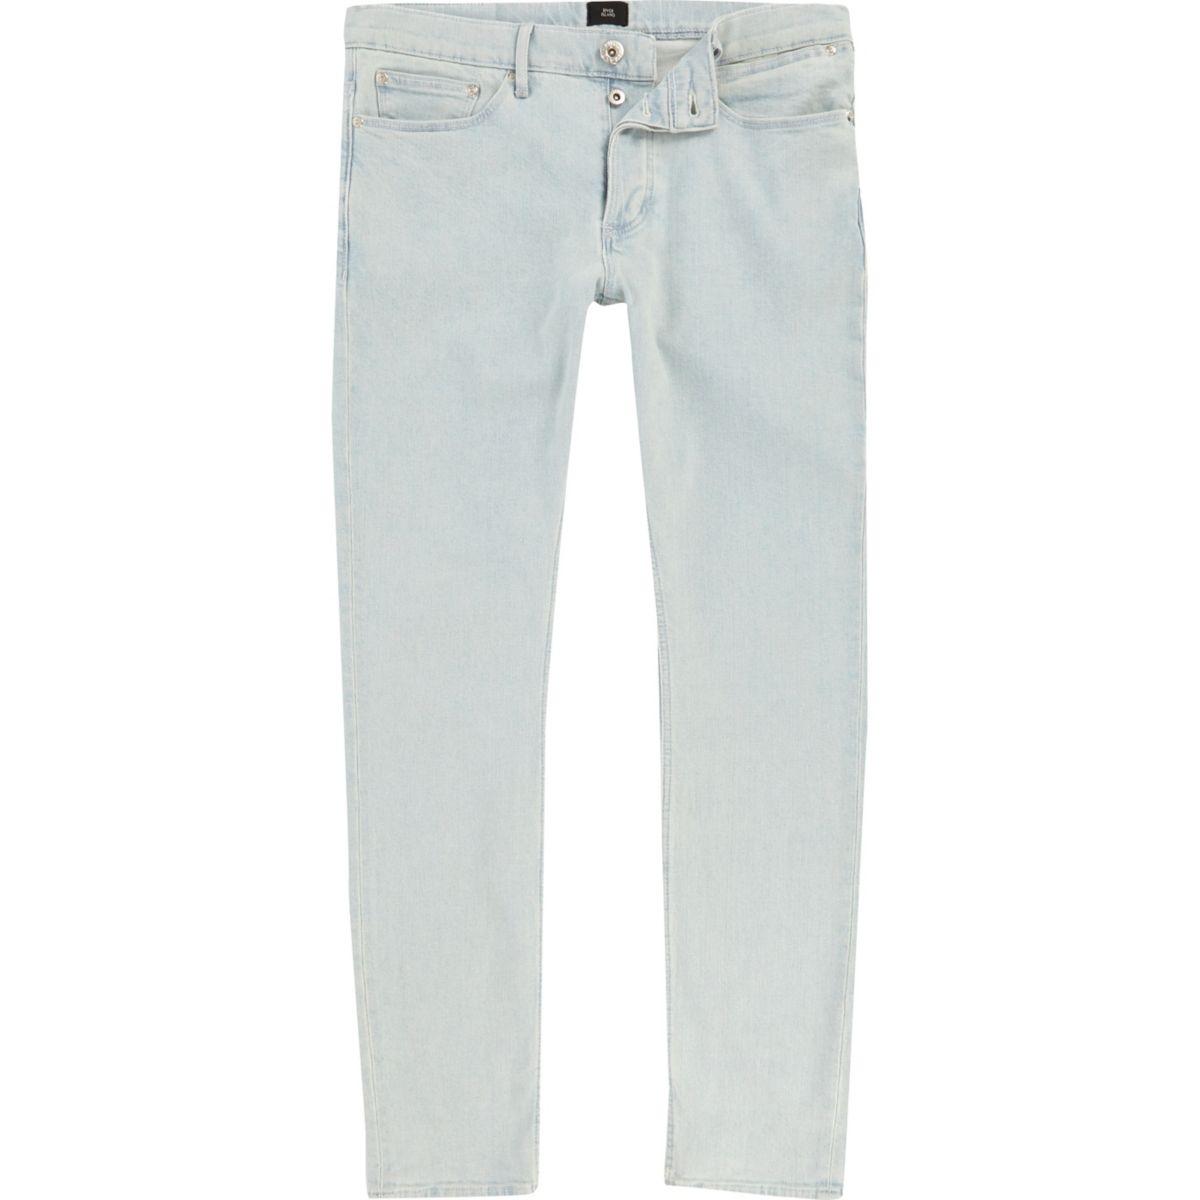 Light blue Sid skinny jeans